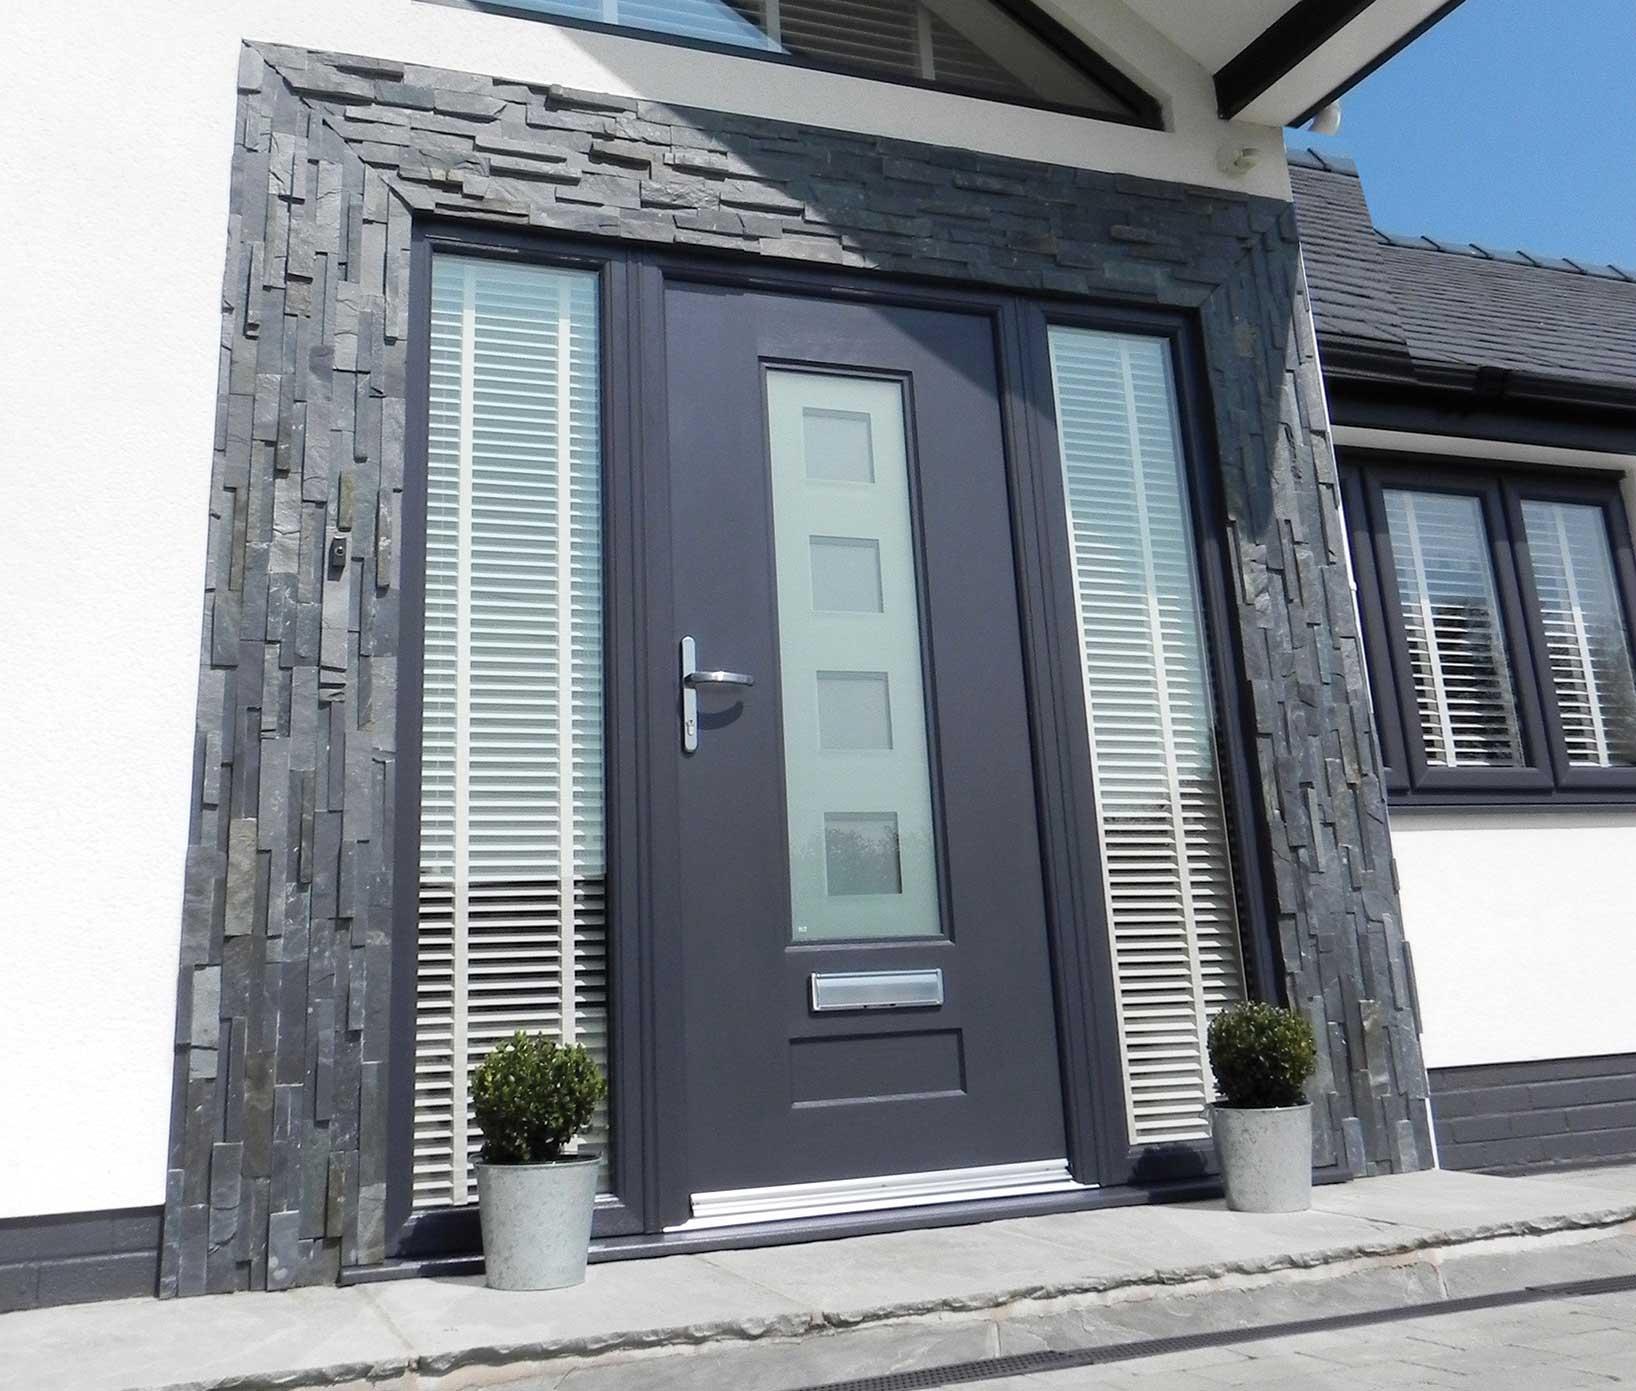 composite doors royal leamington spa